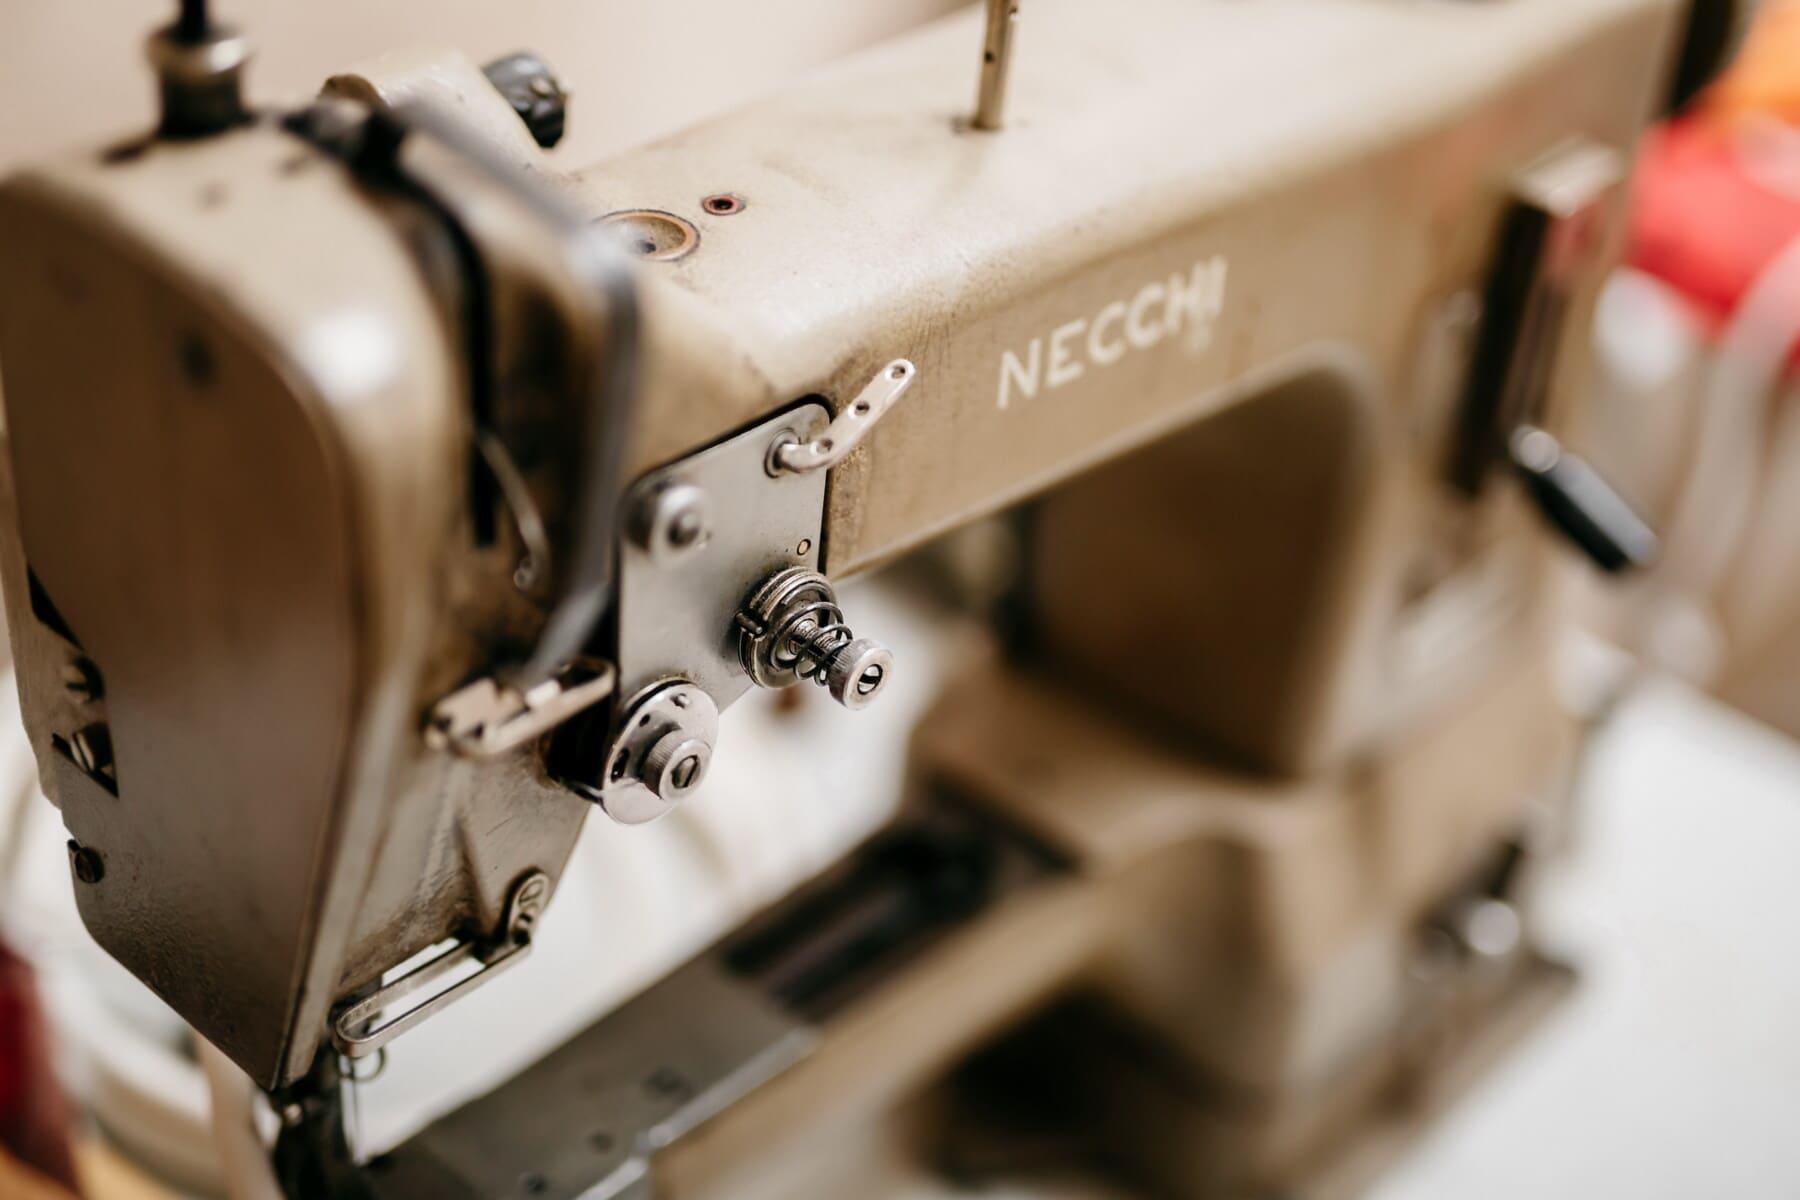 professional, workshop, vintage, sewing machine, light brown, metal, studio, machinery, retro, device